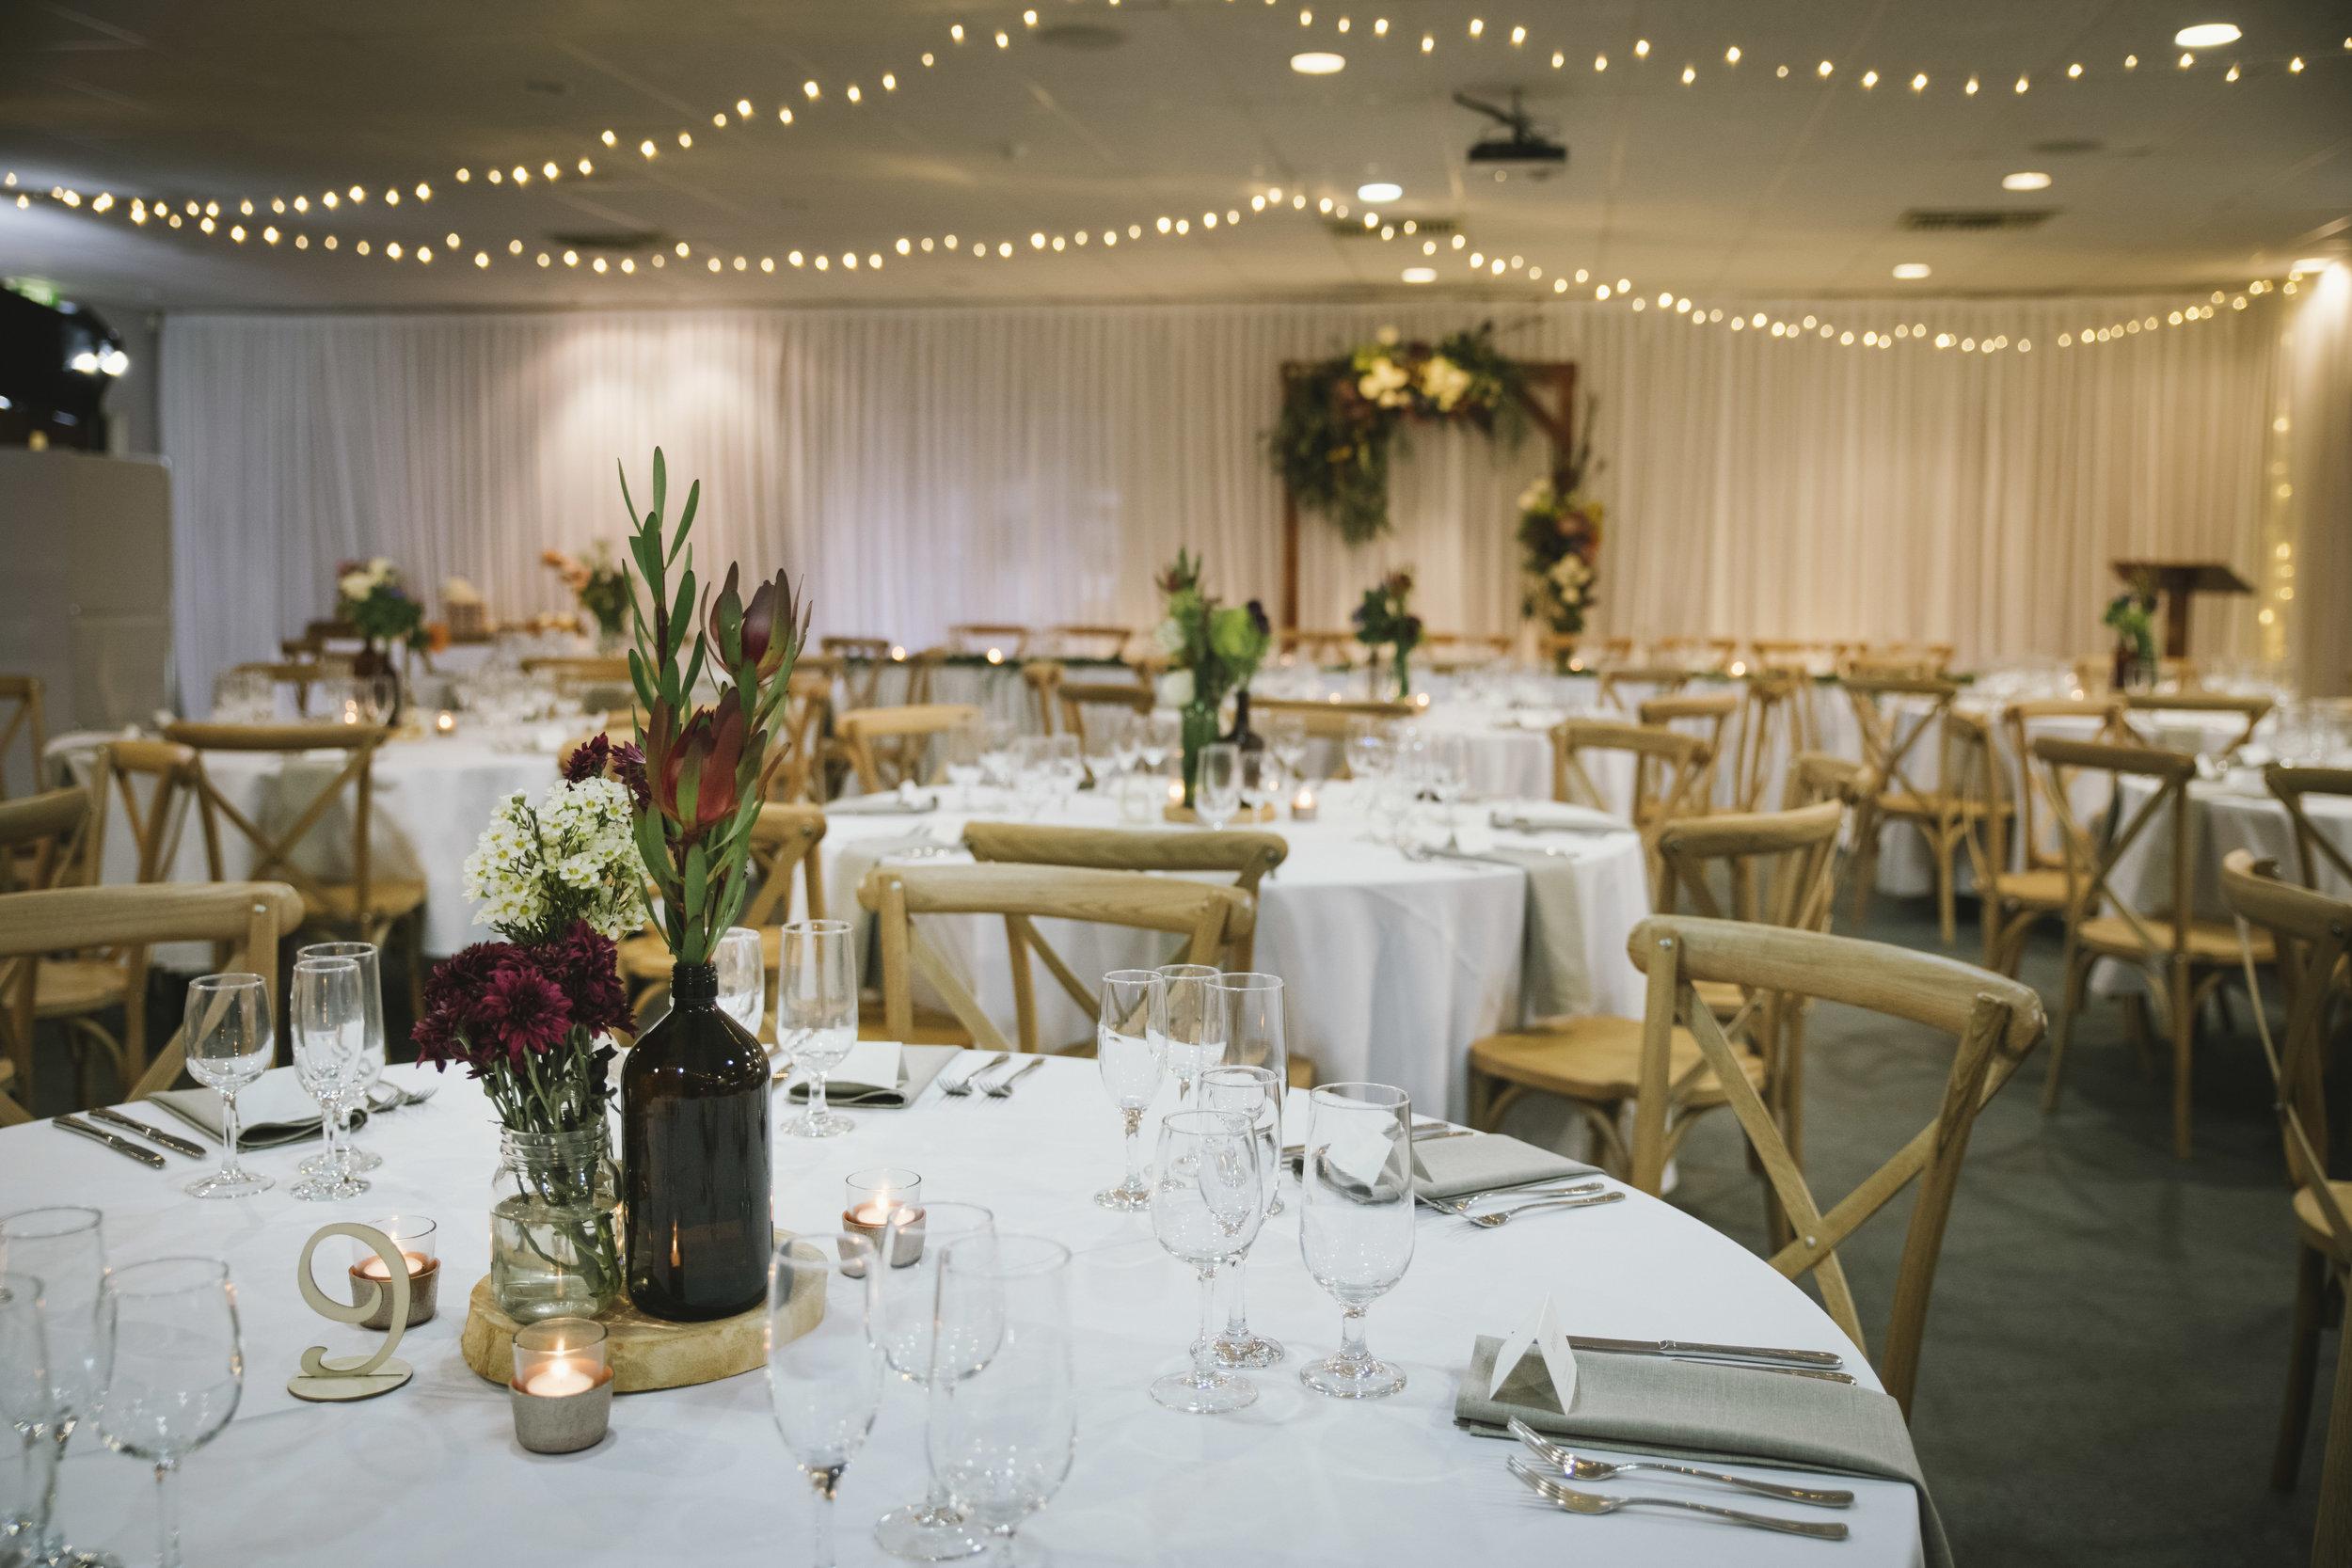 Angie Roe Photography Wheatbelt Avon Valley Farm Wedding (55).jpg